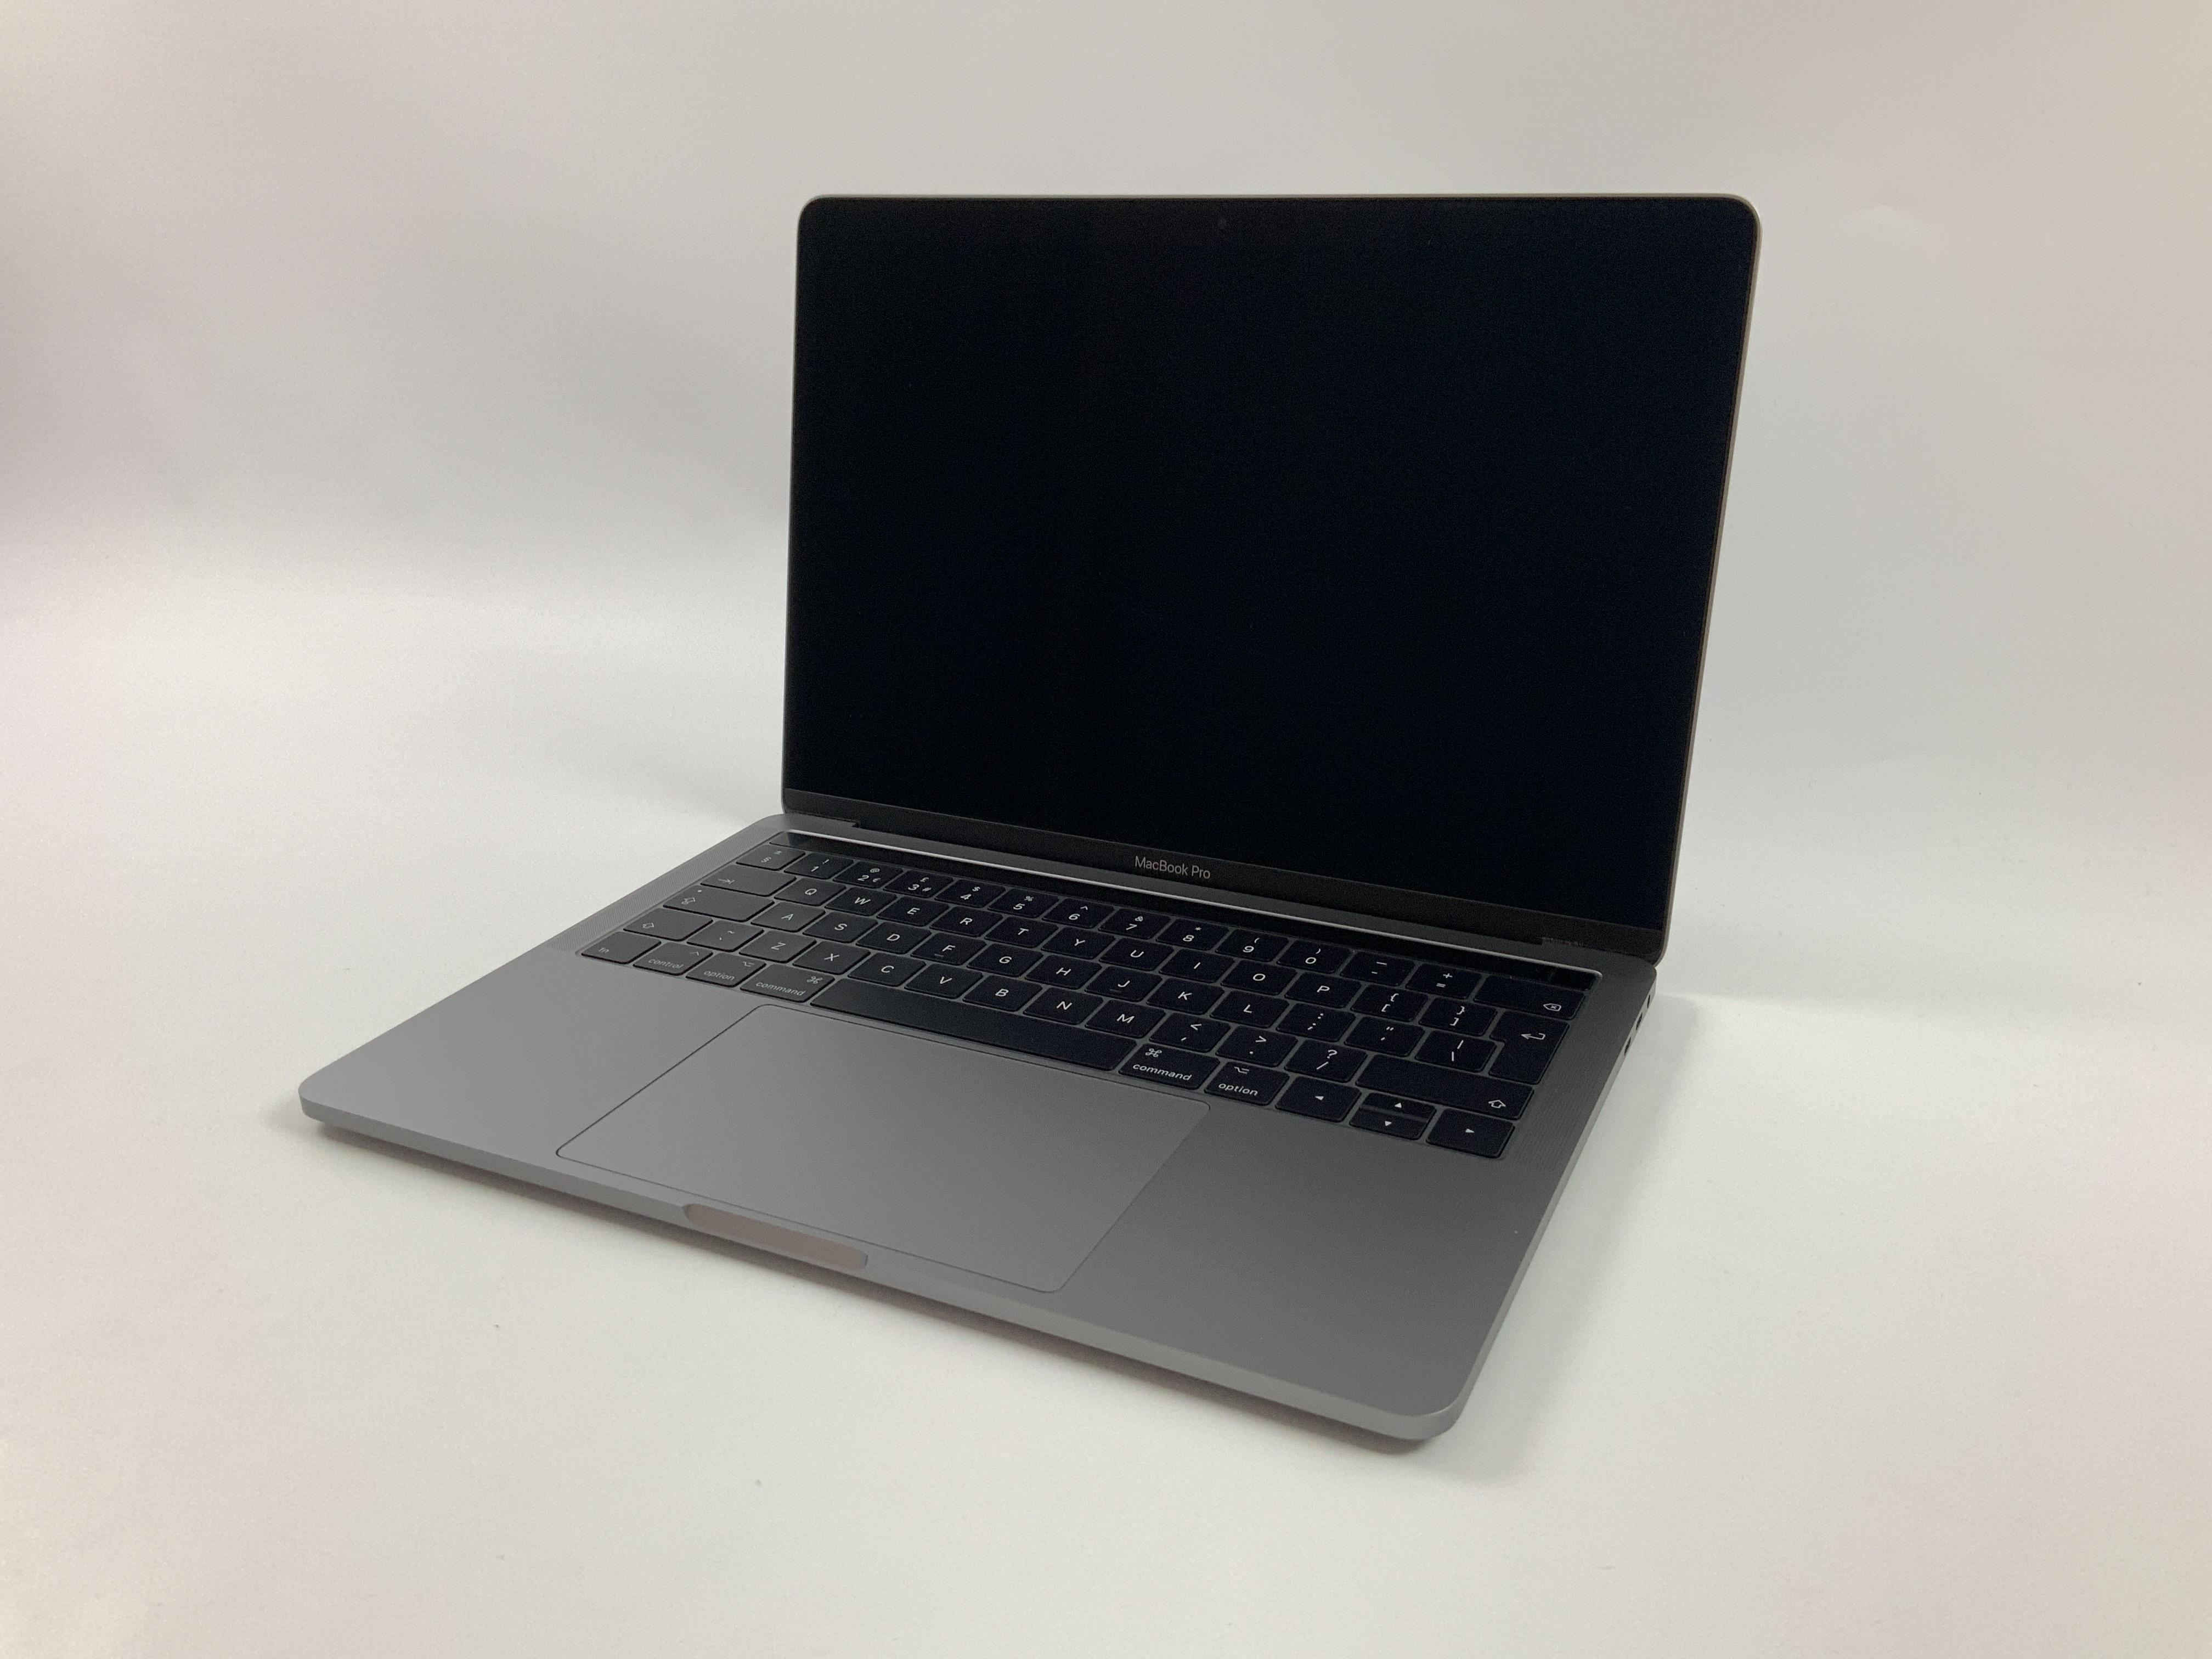 MacBook Pro (13-inch 2017 4 TBT3), 3.1 GHz Intel Core i5, 8 GB 2133 MHz DDR3 SDRAM, 256 GB Flash Storage, image 1